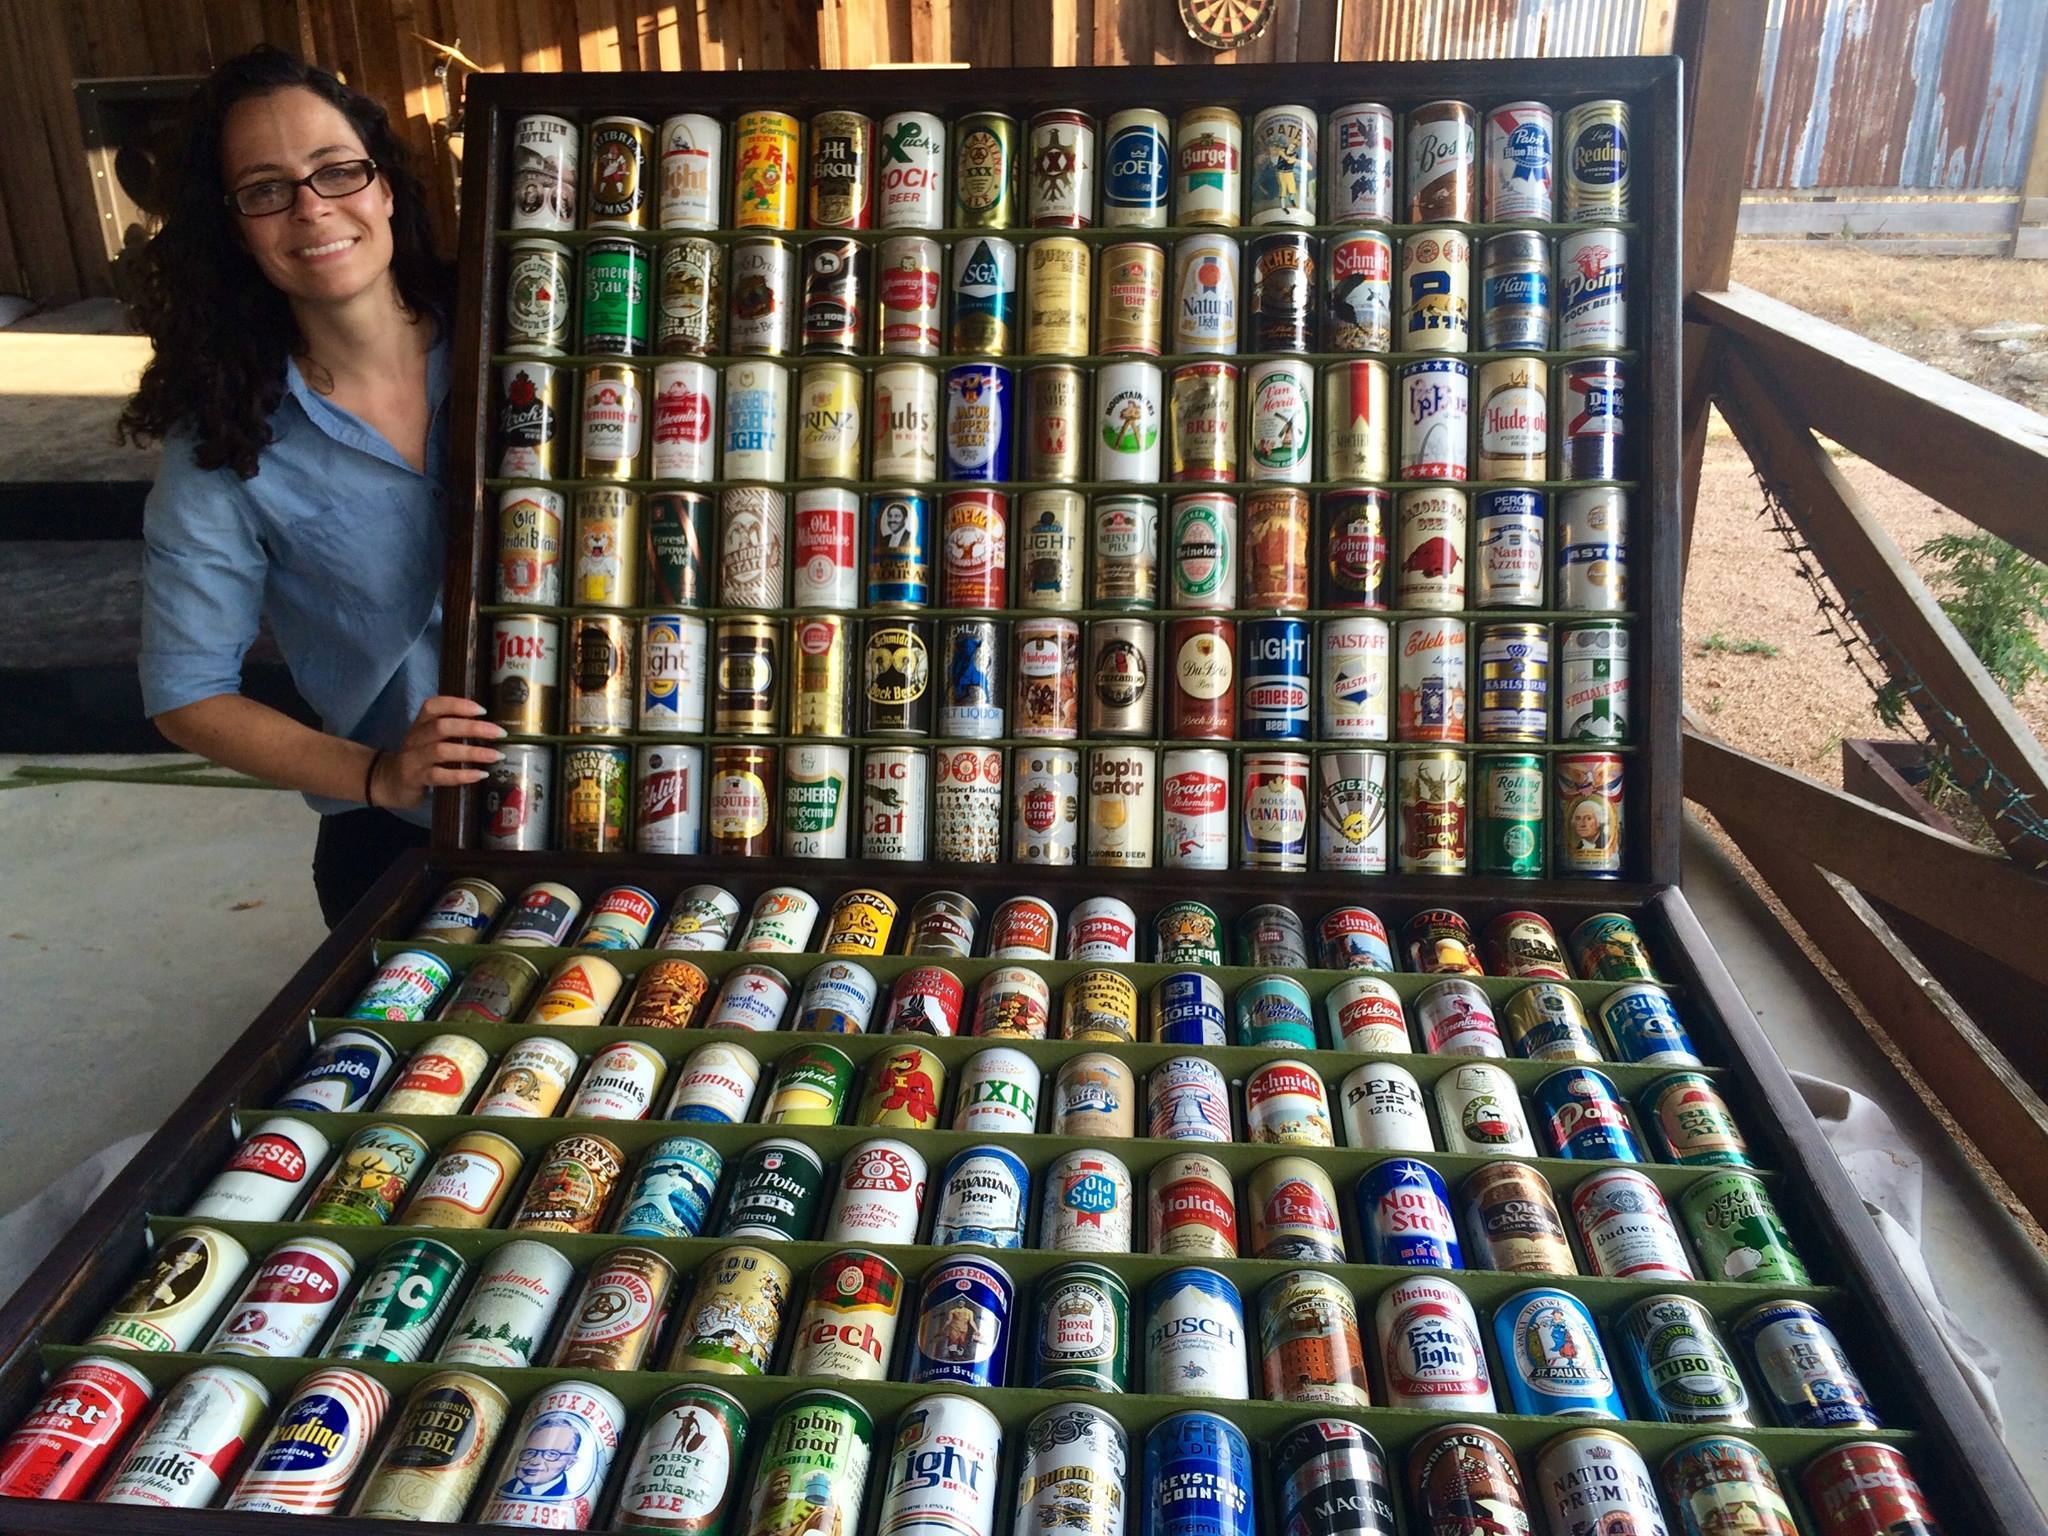 The Beer Museum